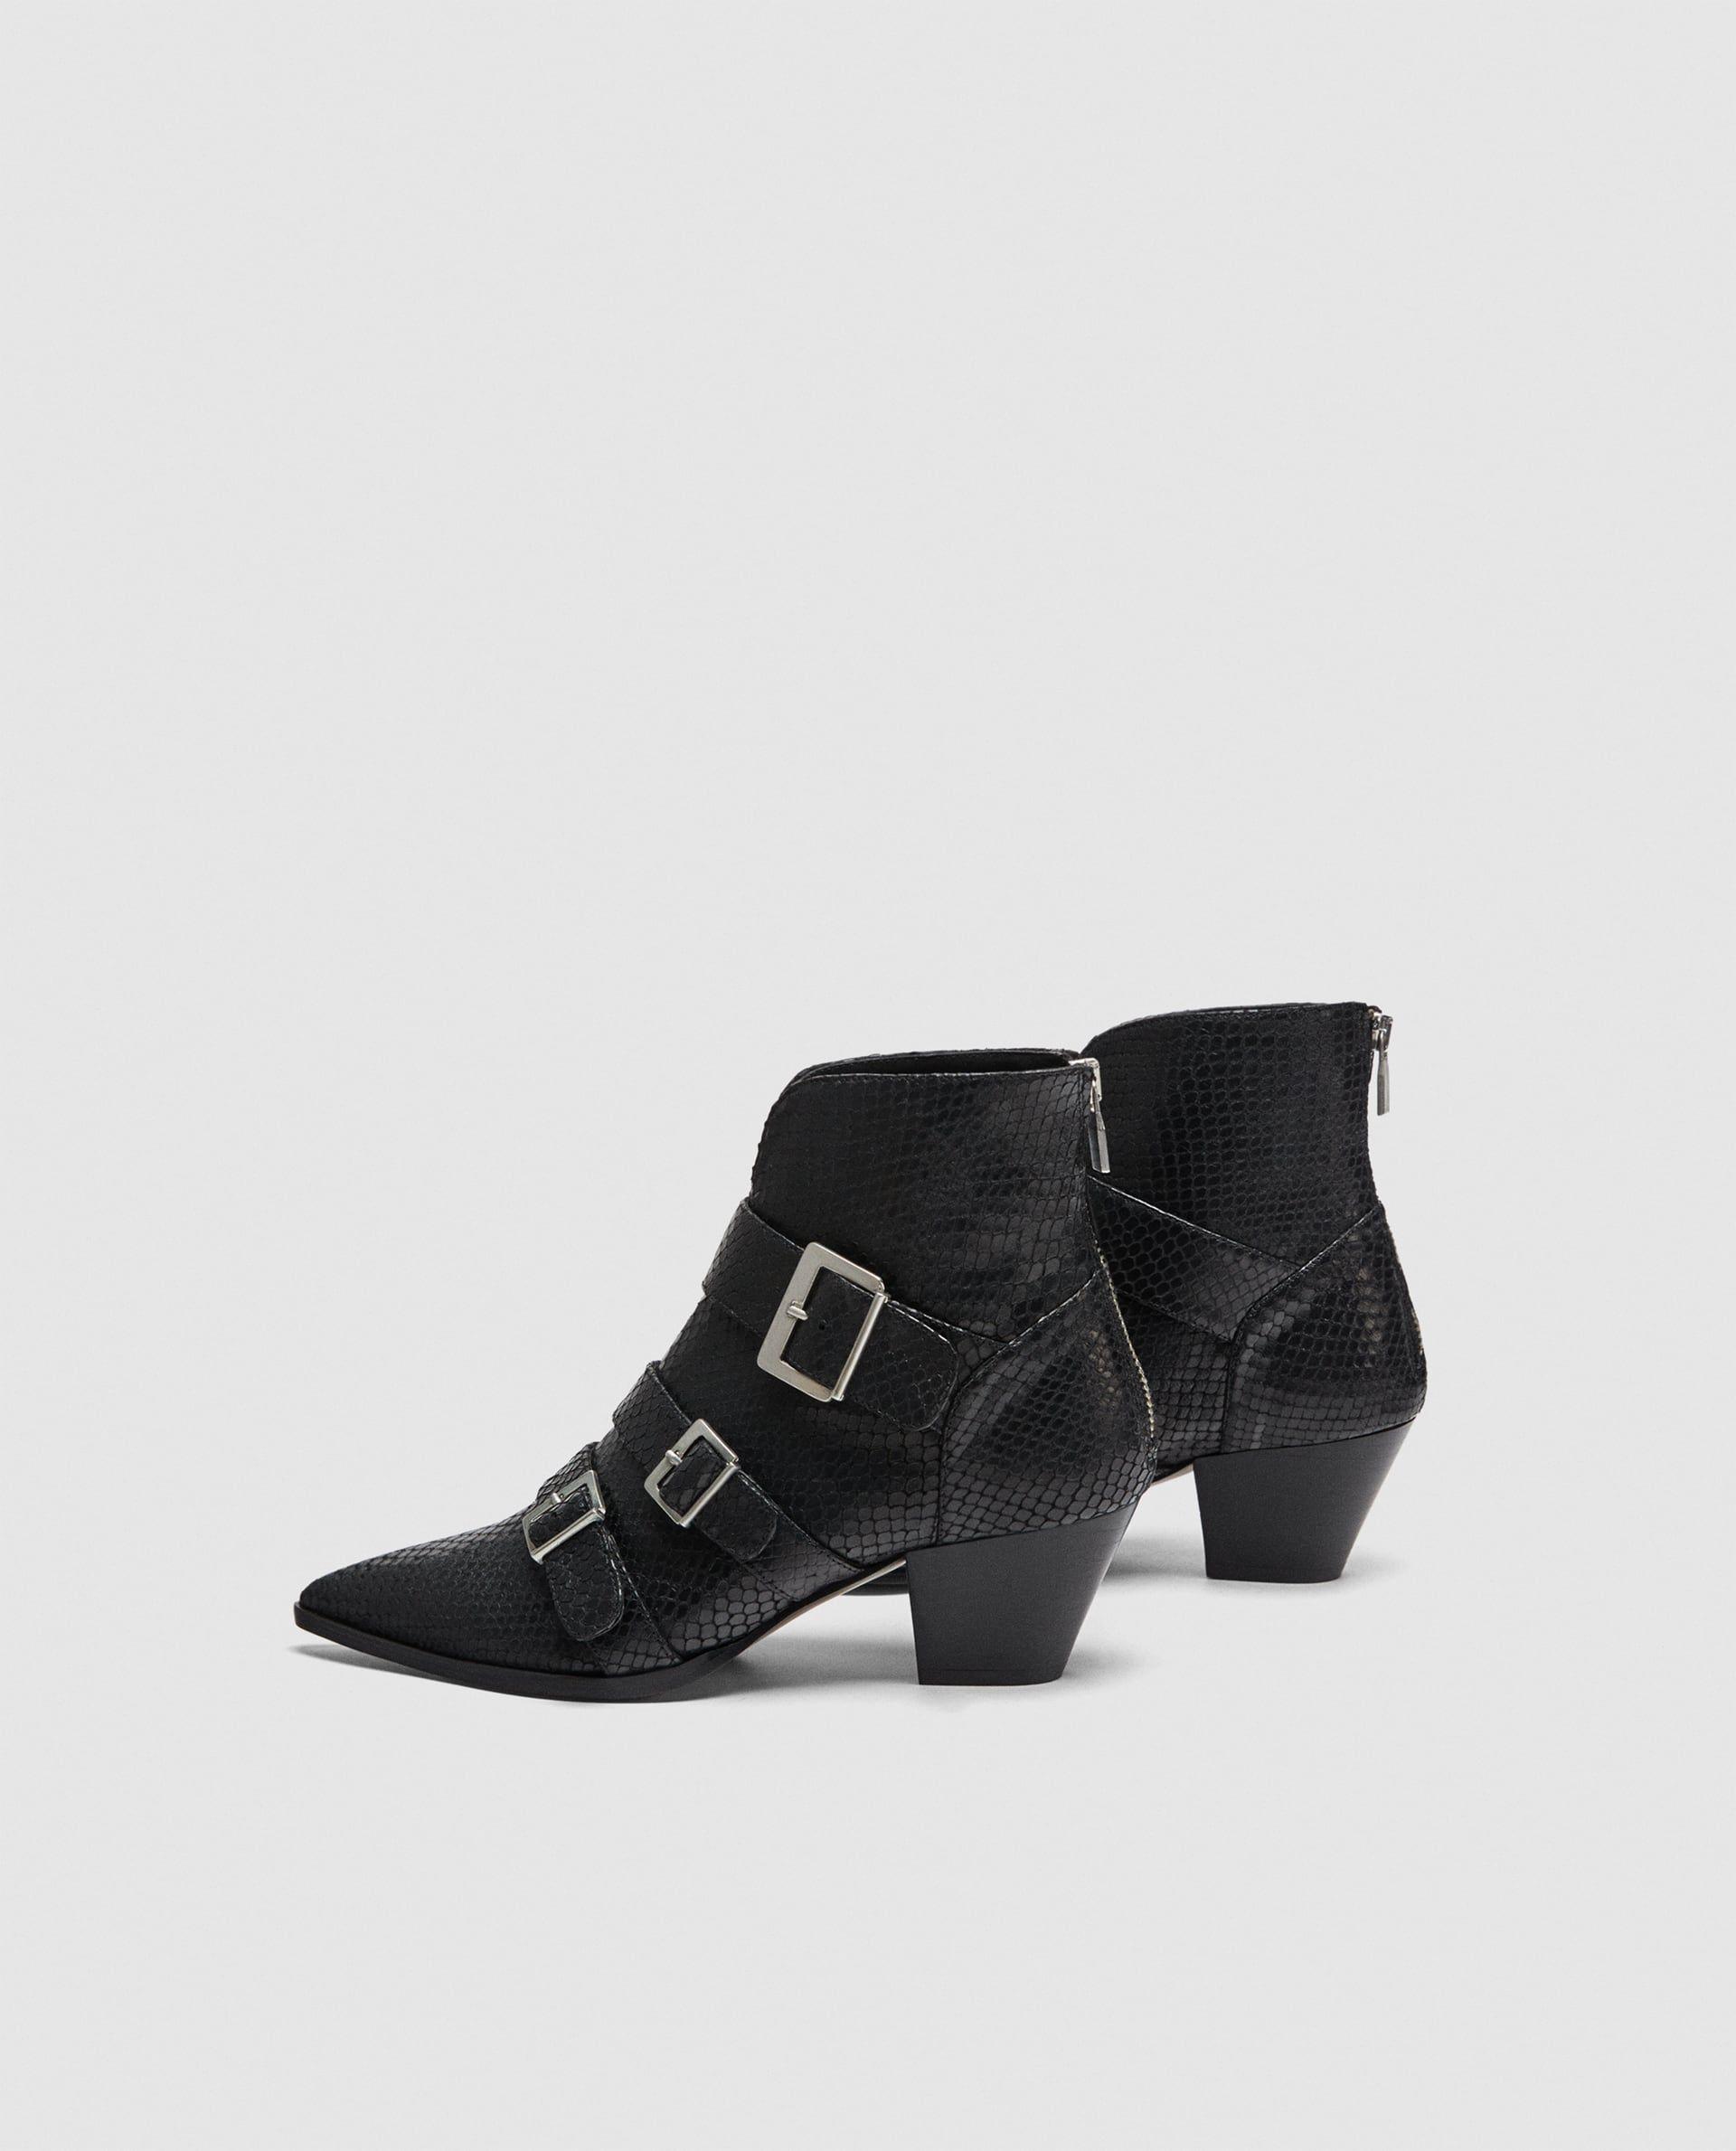 #PopbelaOOTD: Ankle Boots yang Cocok untuk Hangout